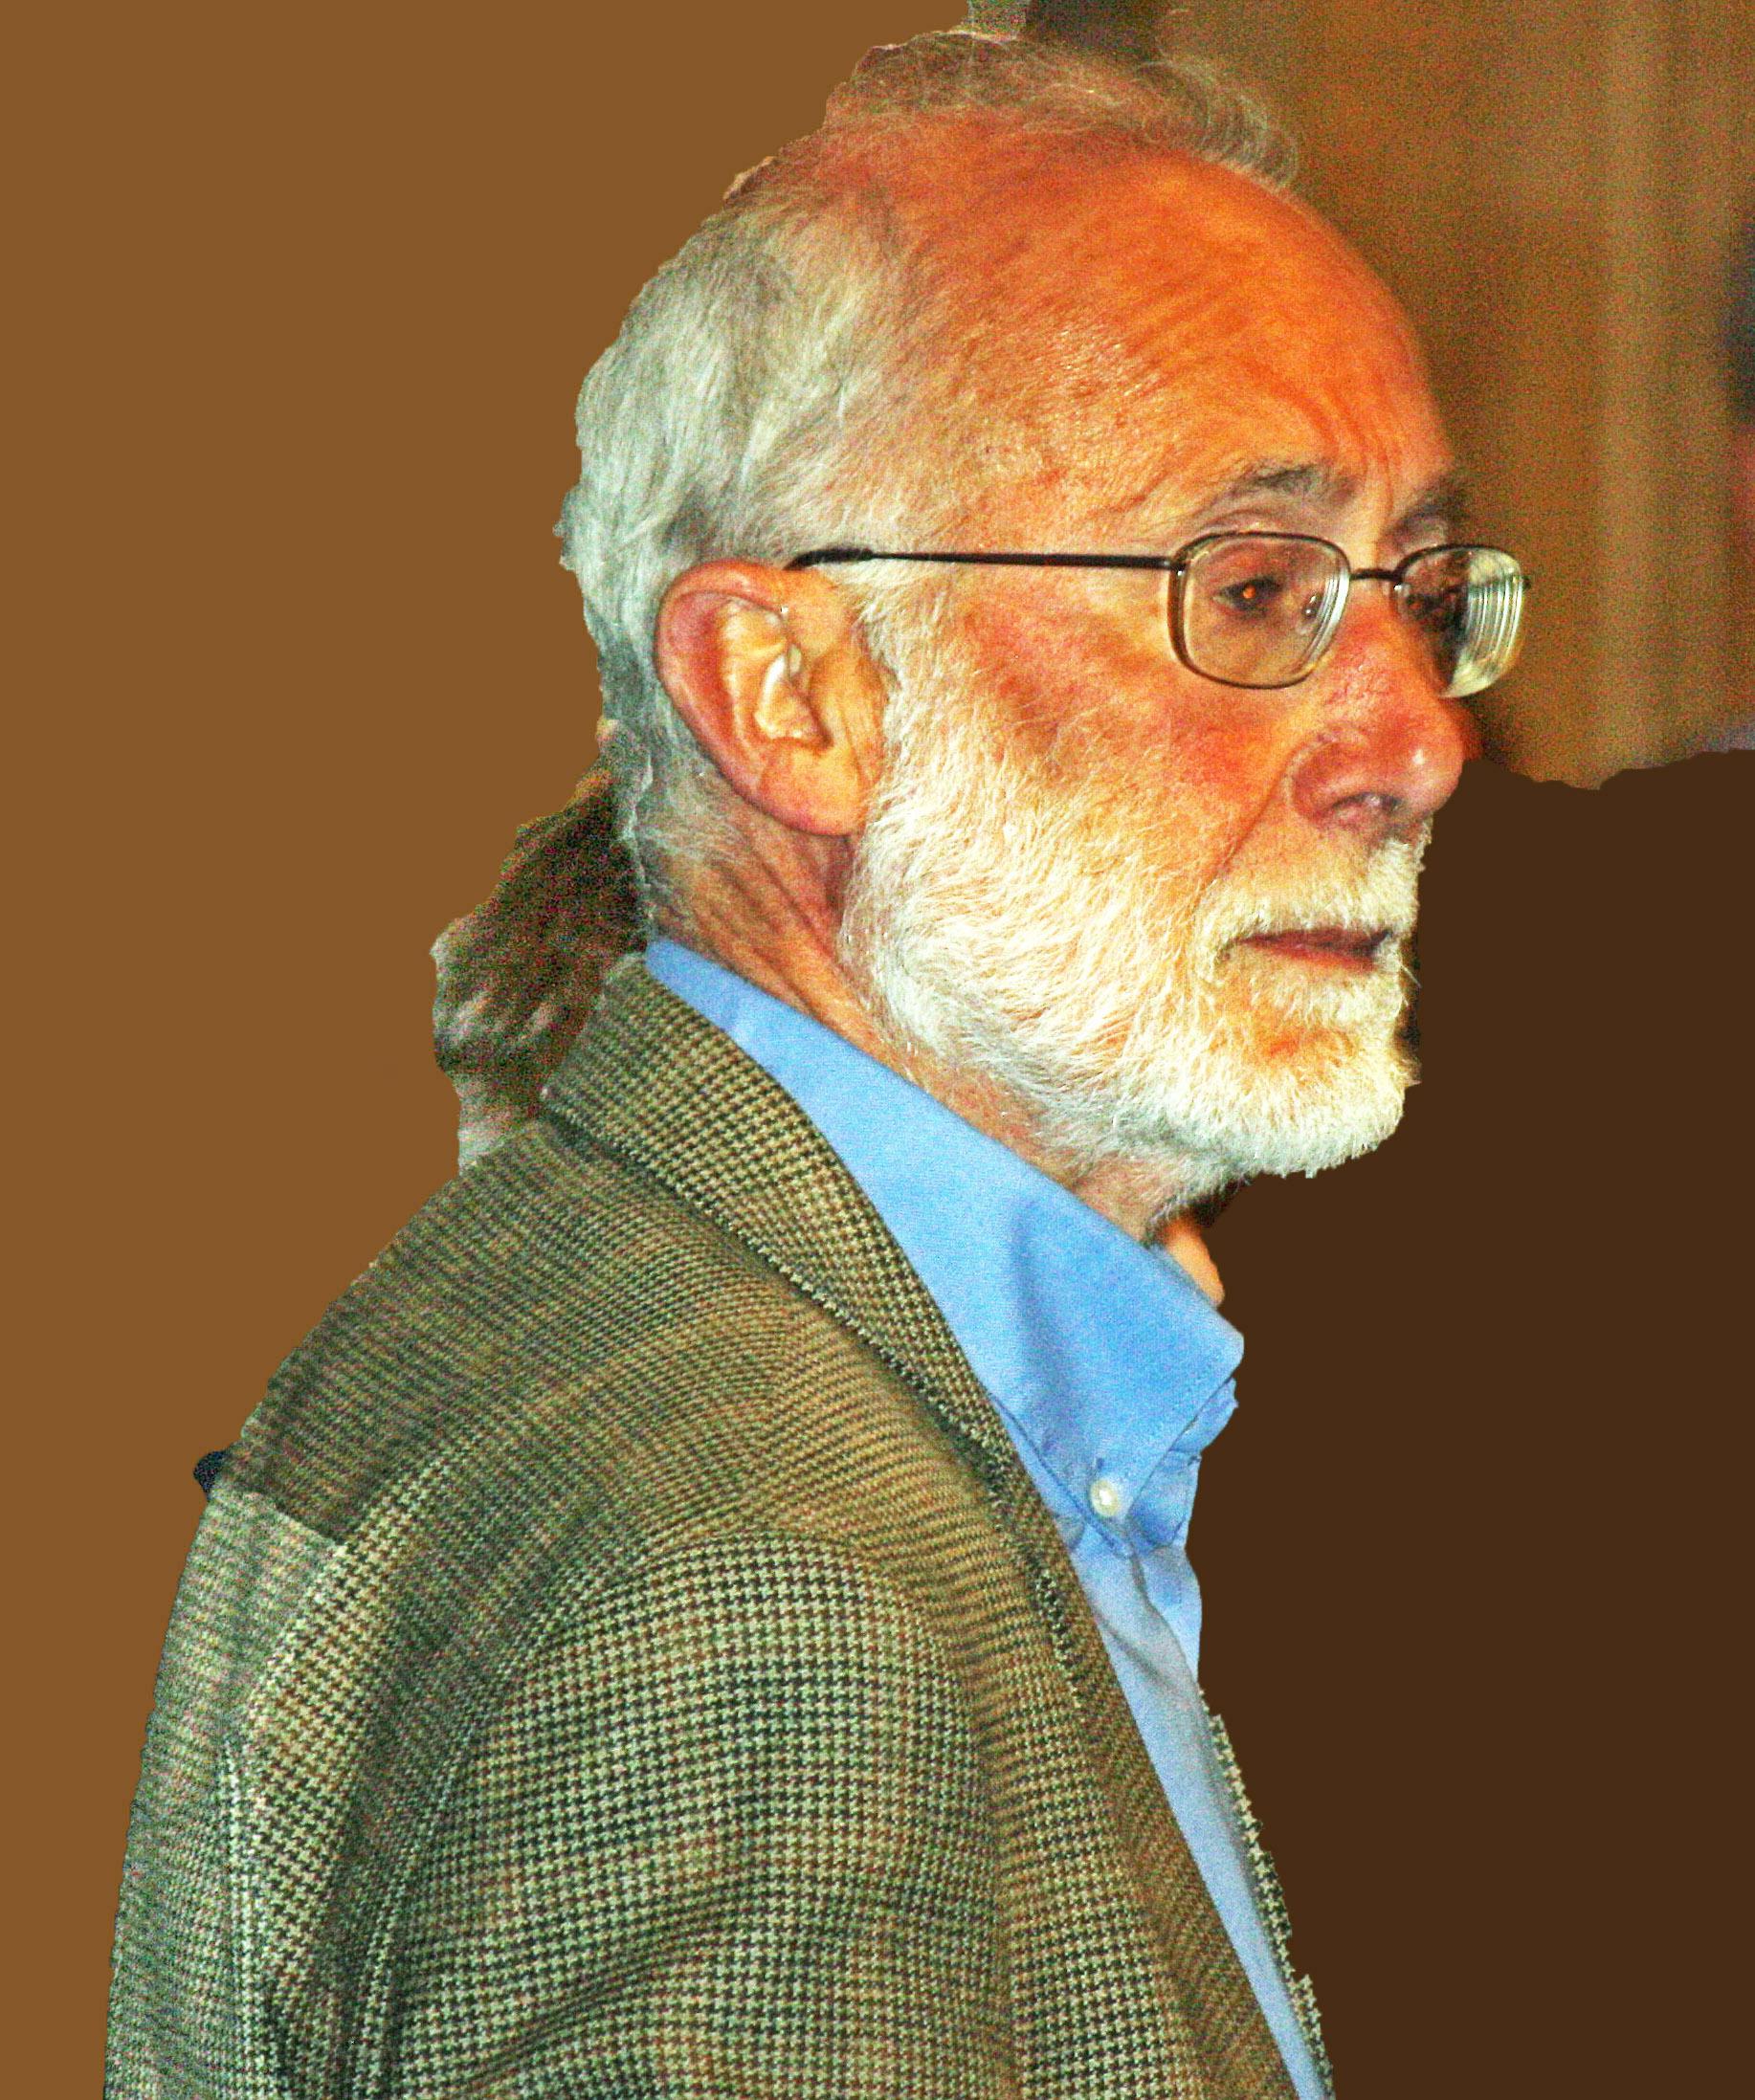 Branch Chairman, Patrick Mark